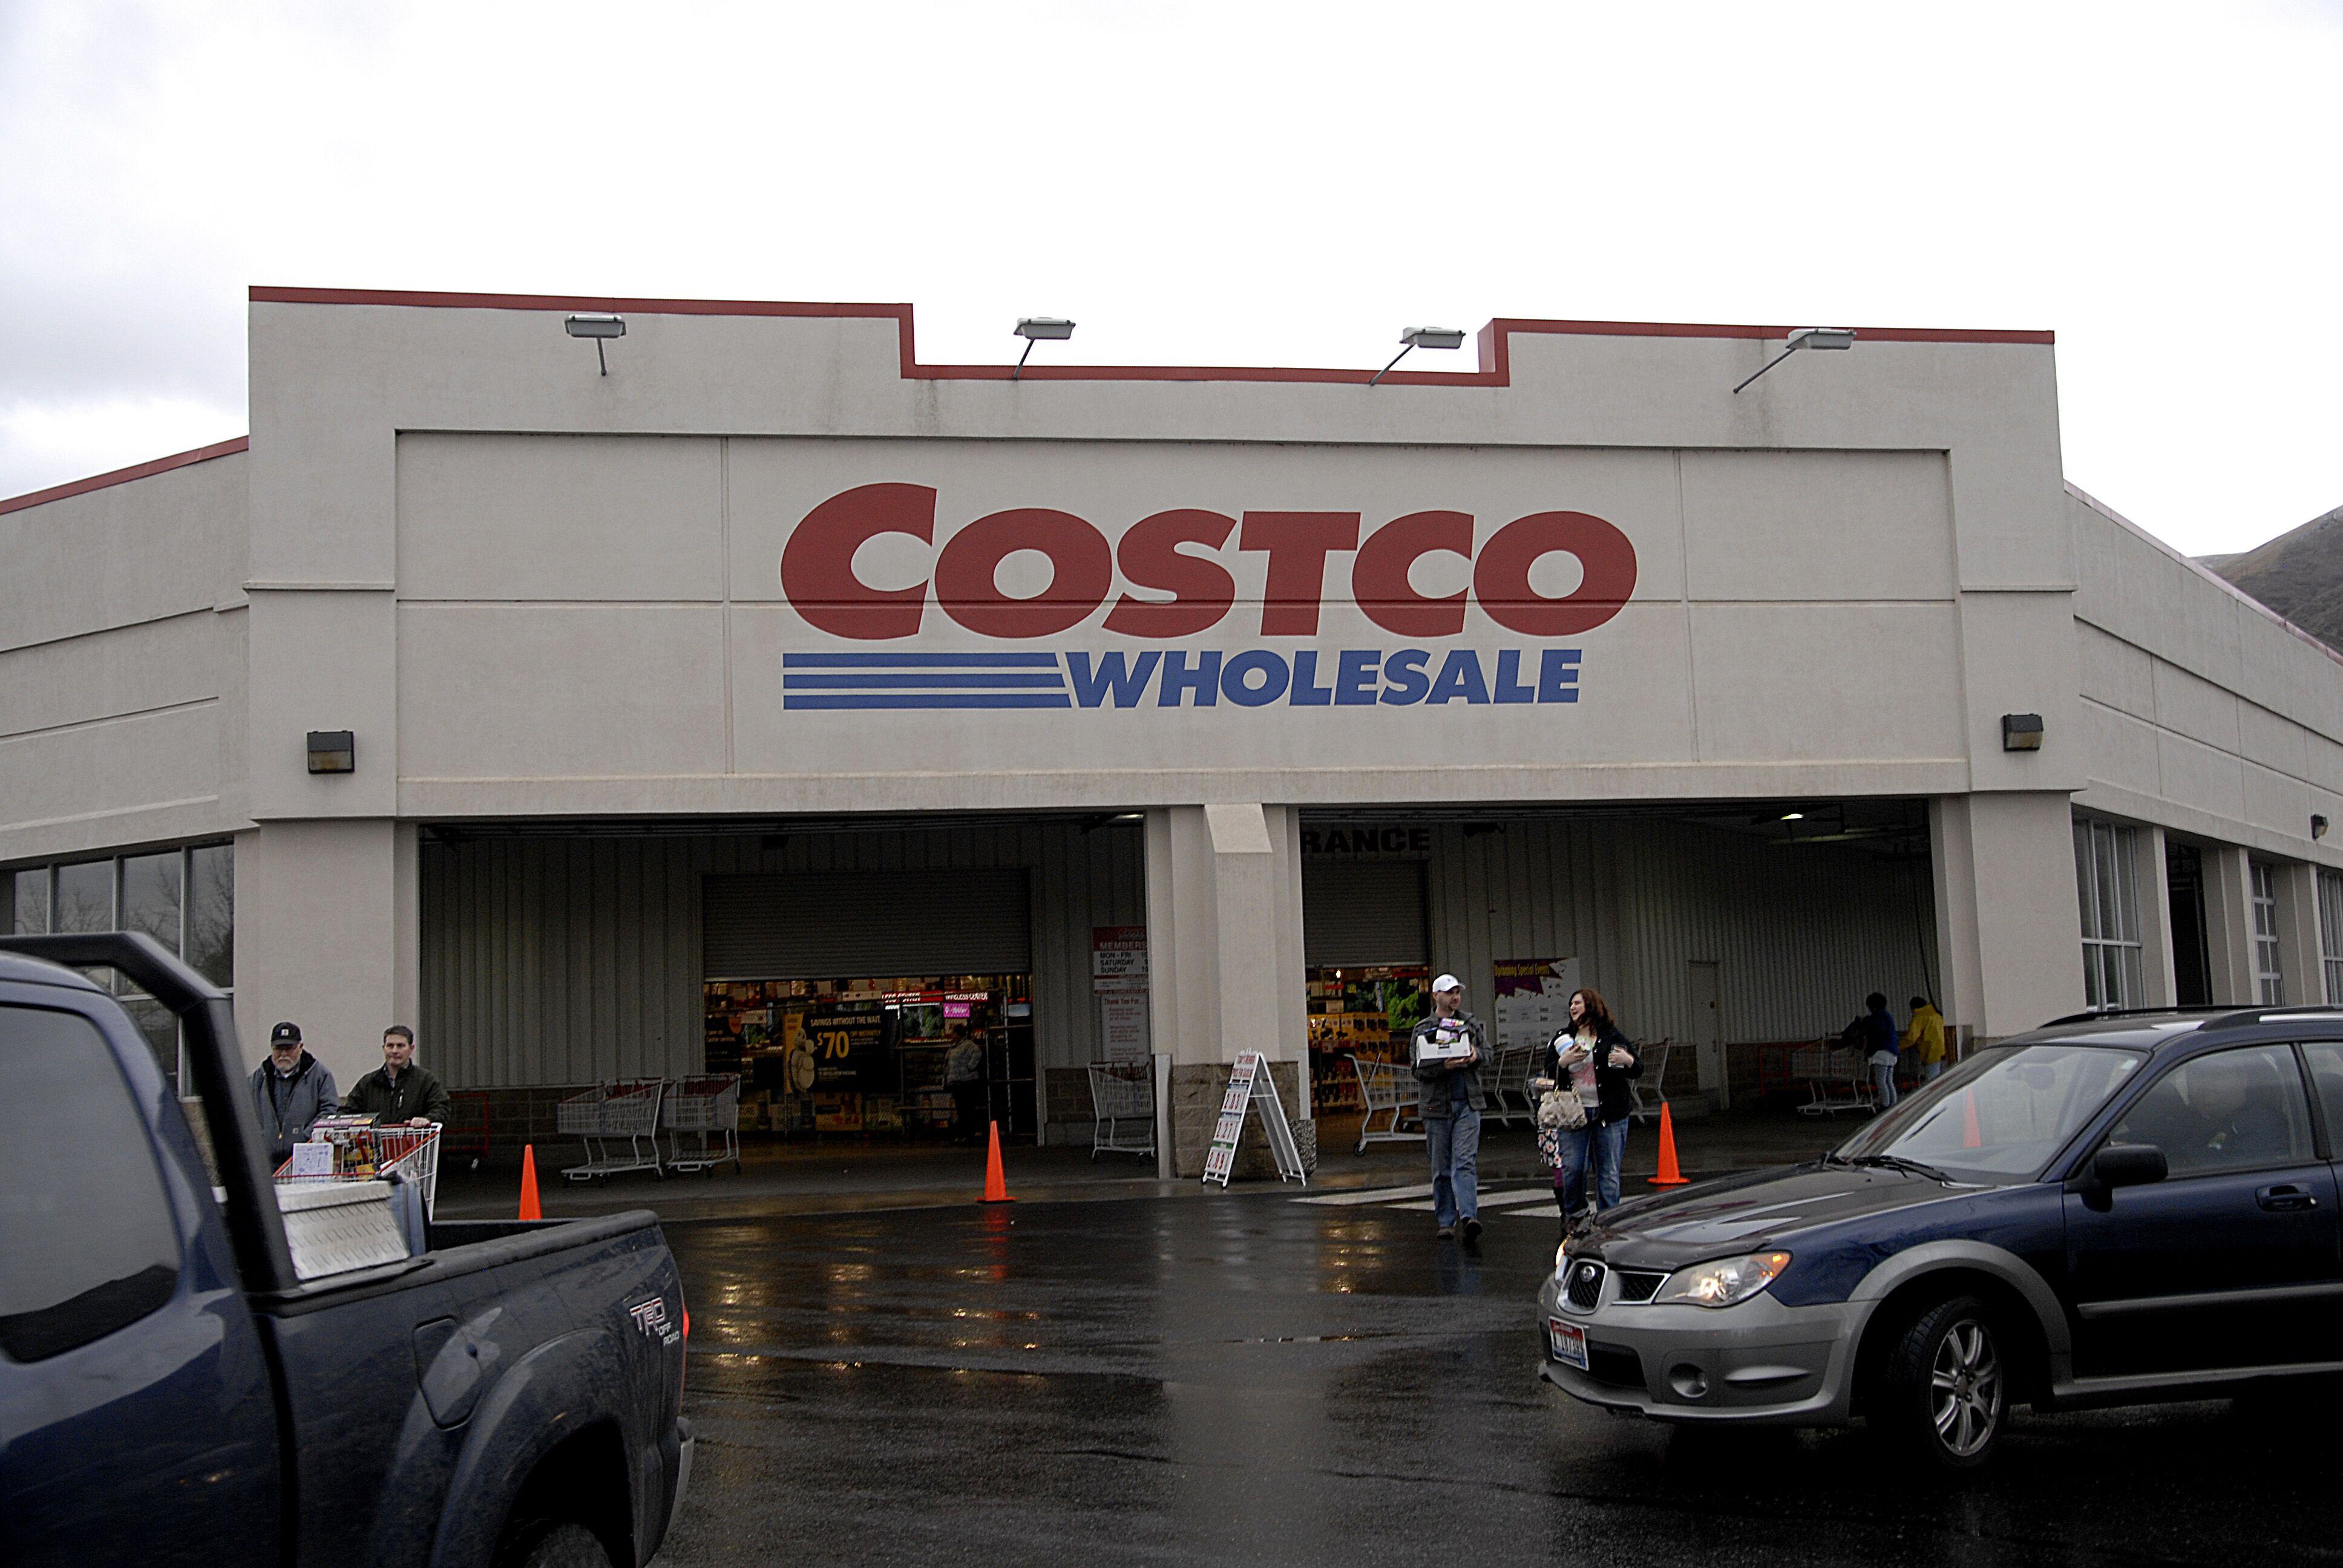 is costco open on christmas